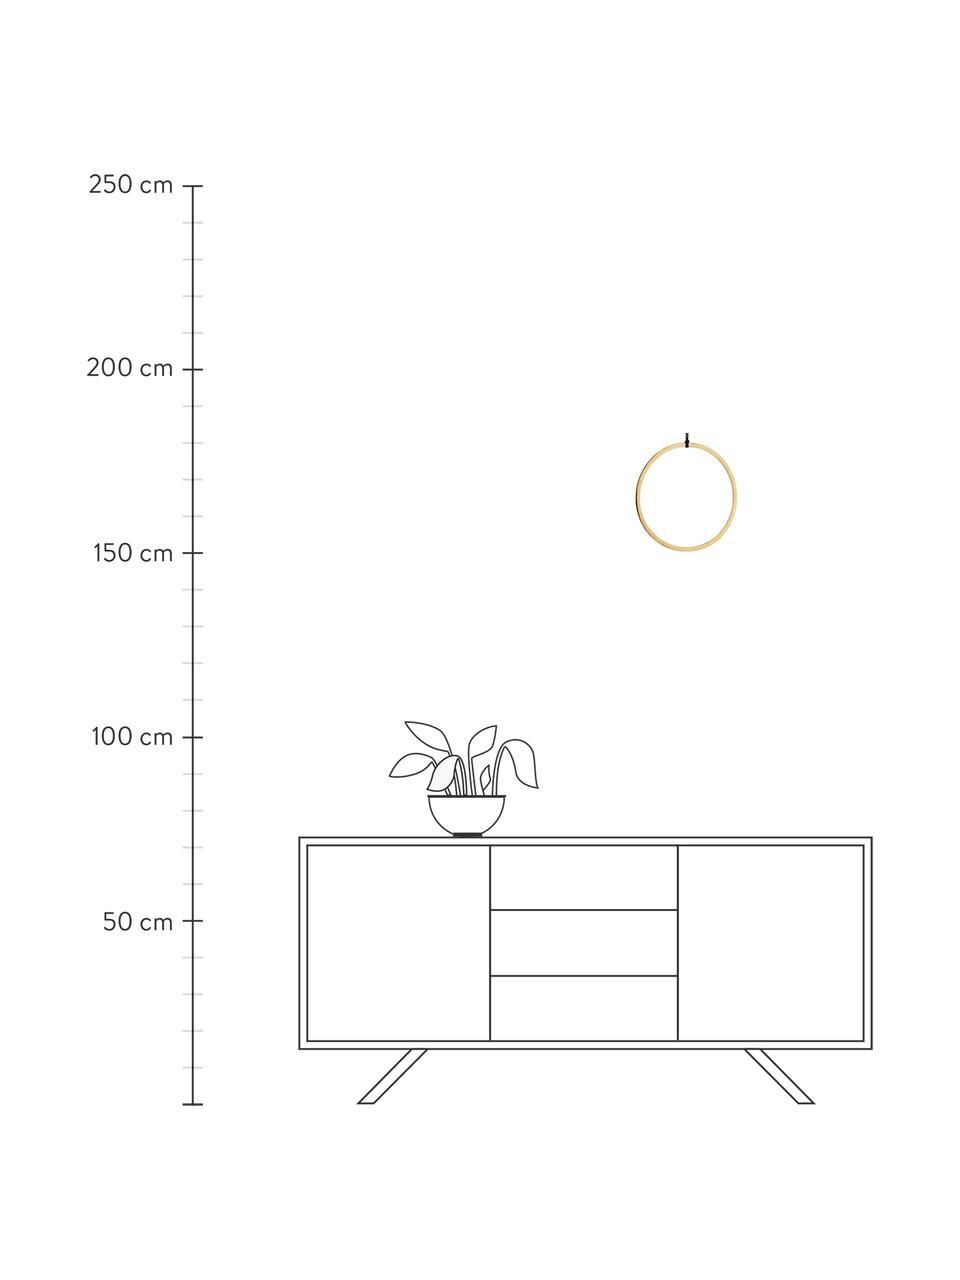 Wandobjekt Turi aus Metall, Metall, beschichtet, Baumwolle, Messingfarben, Schwarz, Ø 28 cm